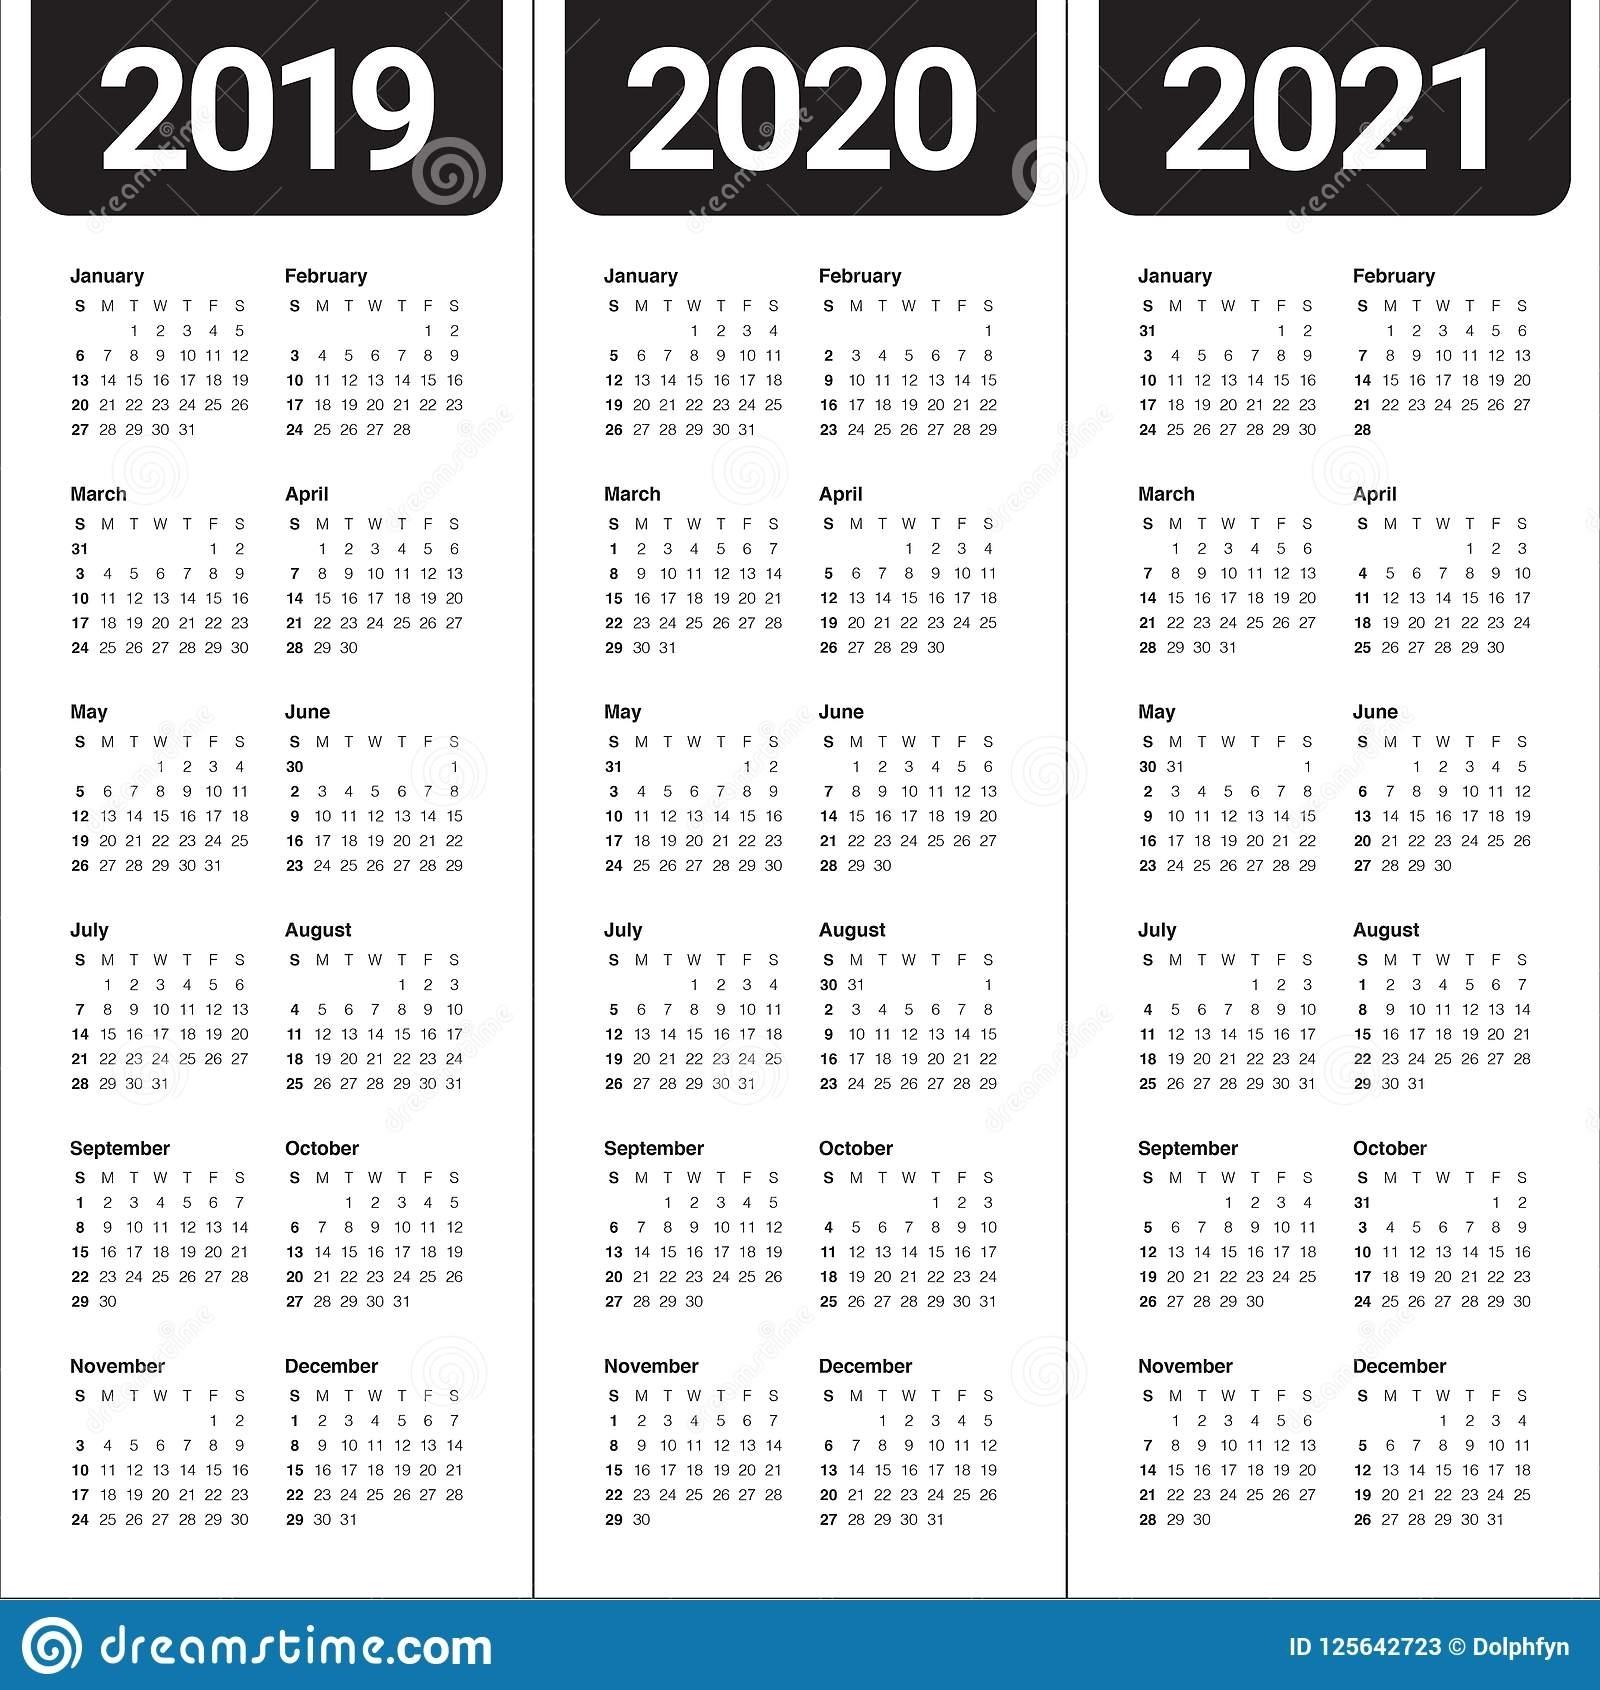 Year 2019 2020 2021 Calendar Vector Design Template Stock Vector for 3 Year Calendar 2019 2020 2021